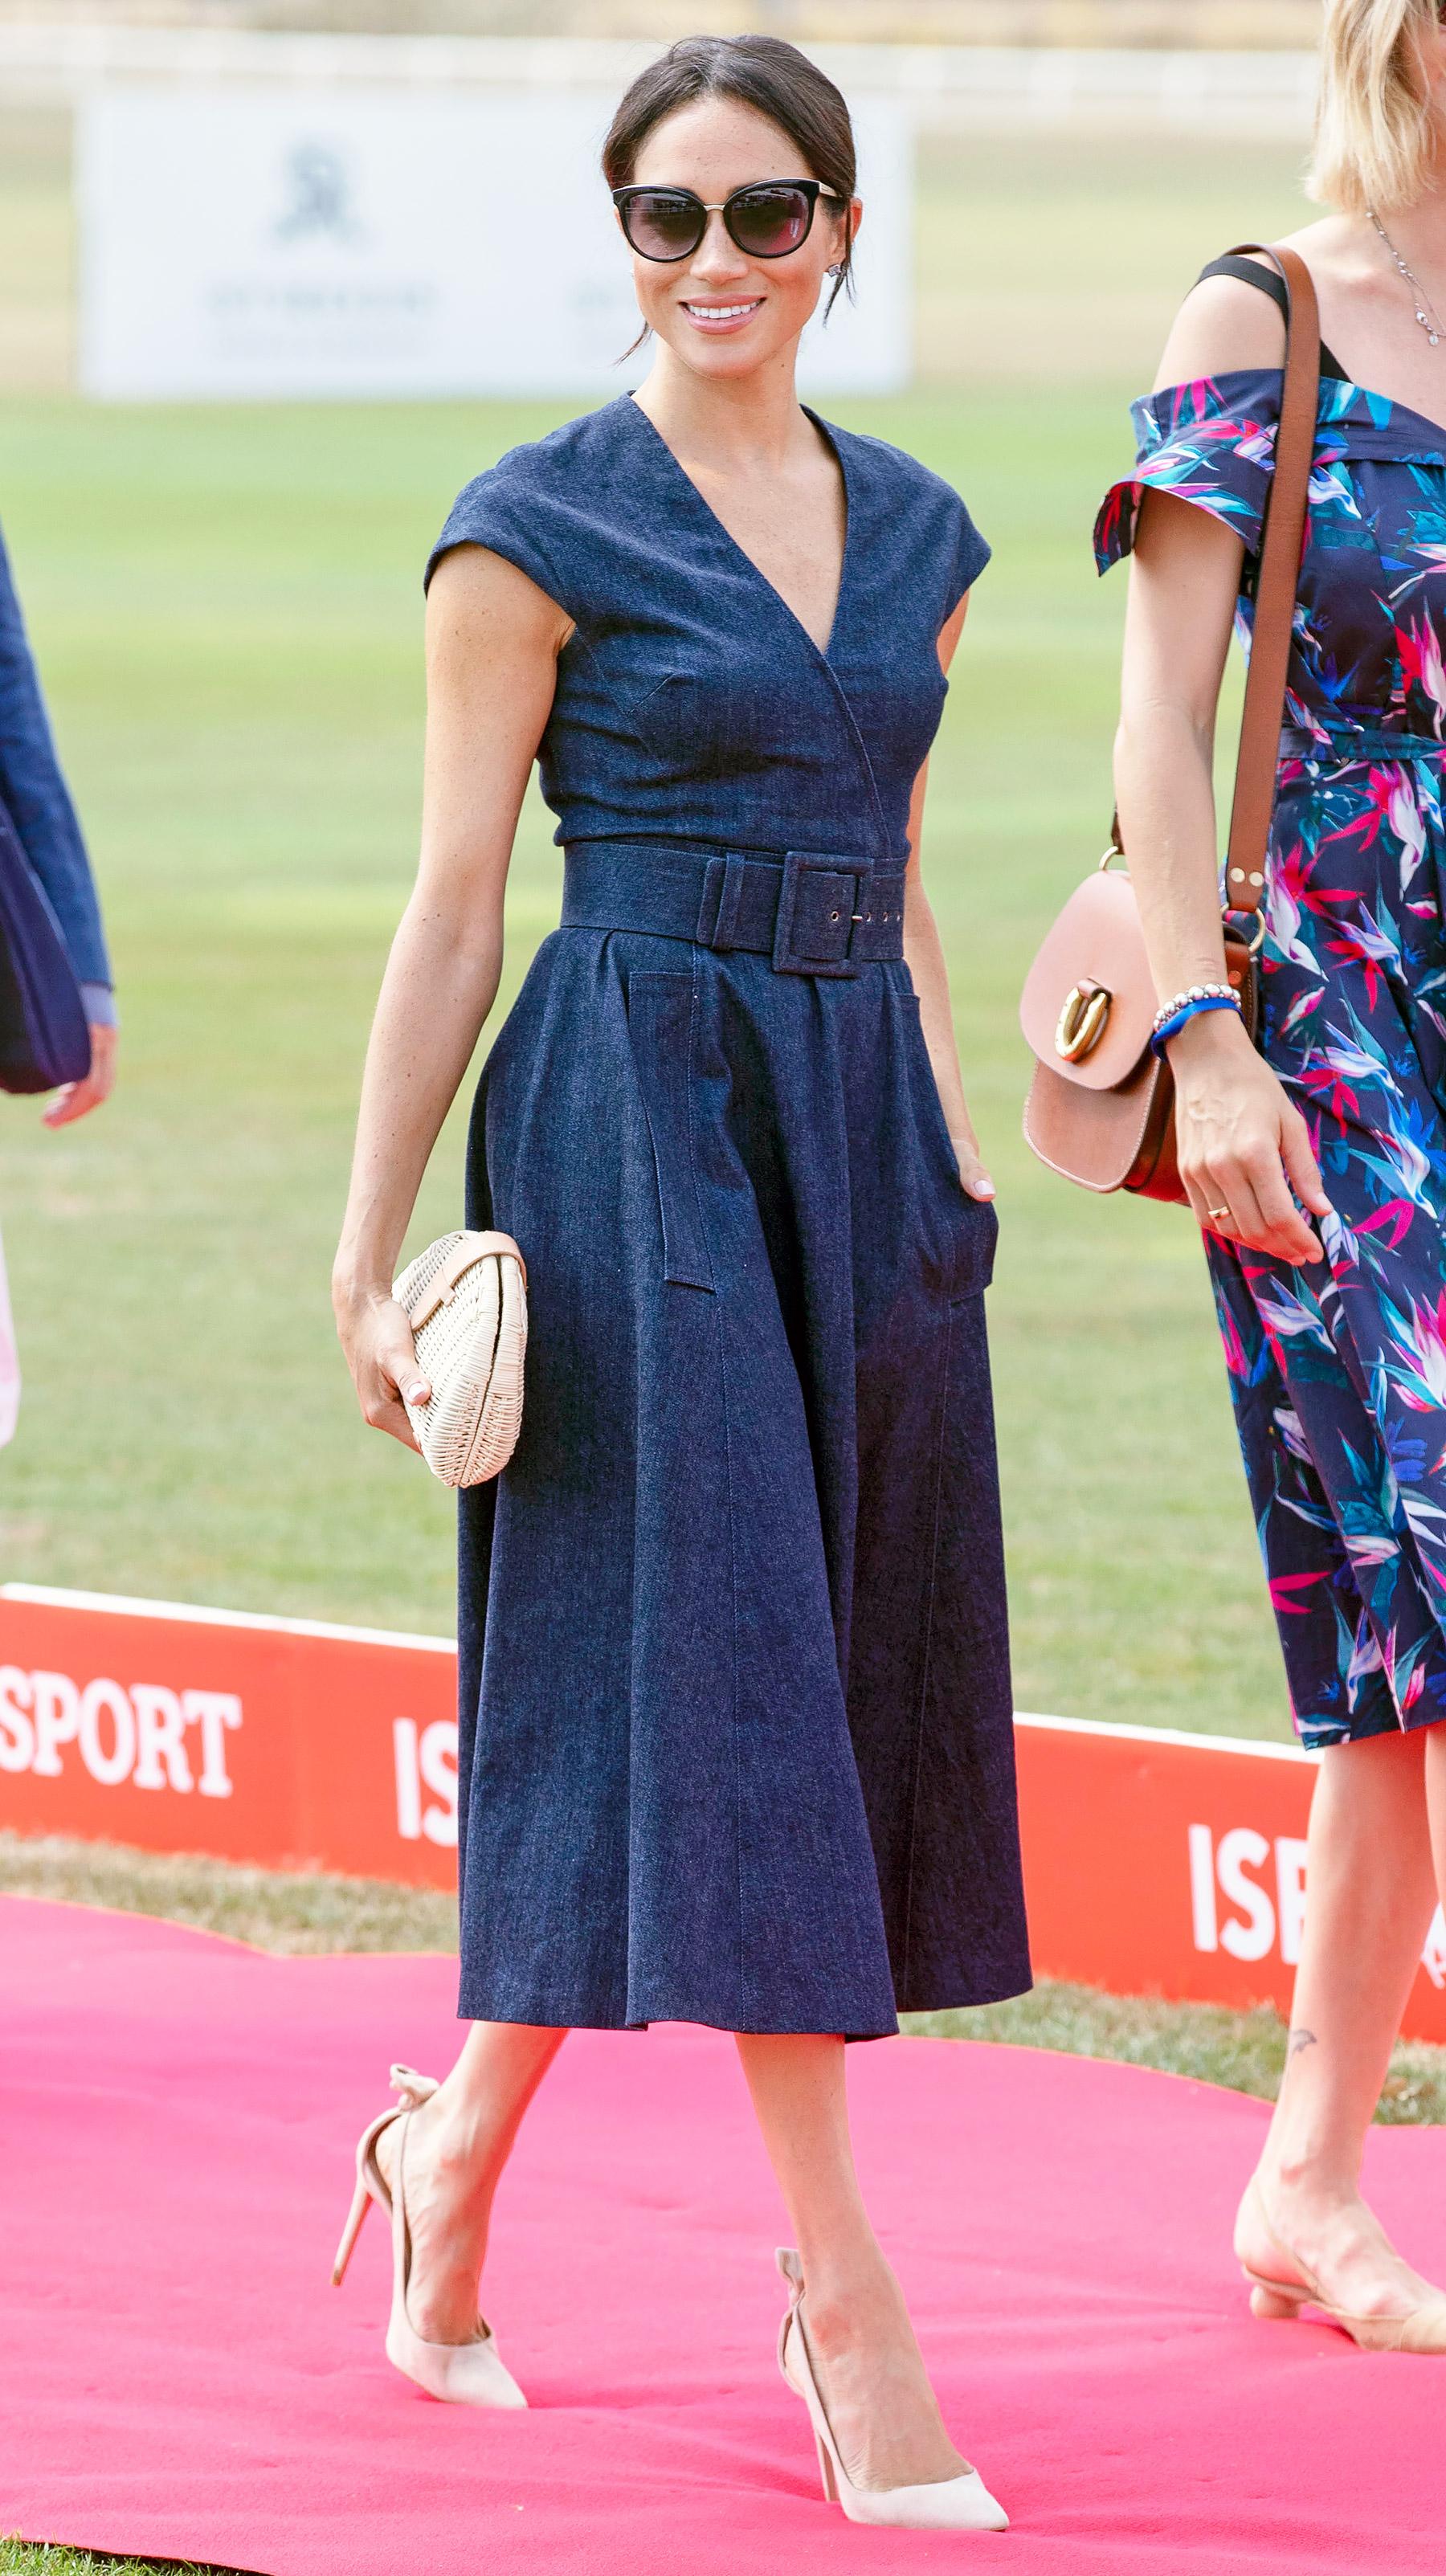 Đầm classic blue thắt lưng của Meghan Markle